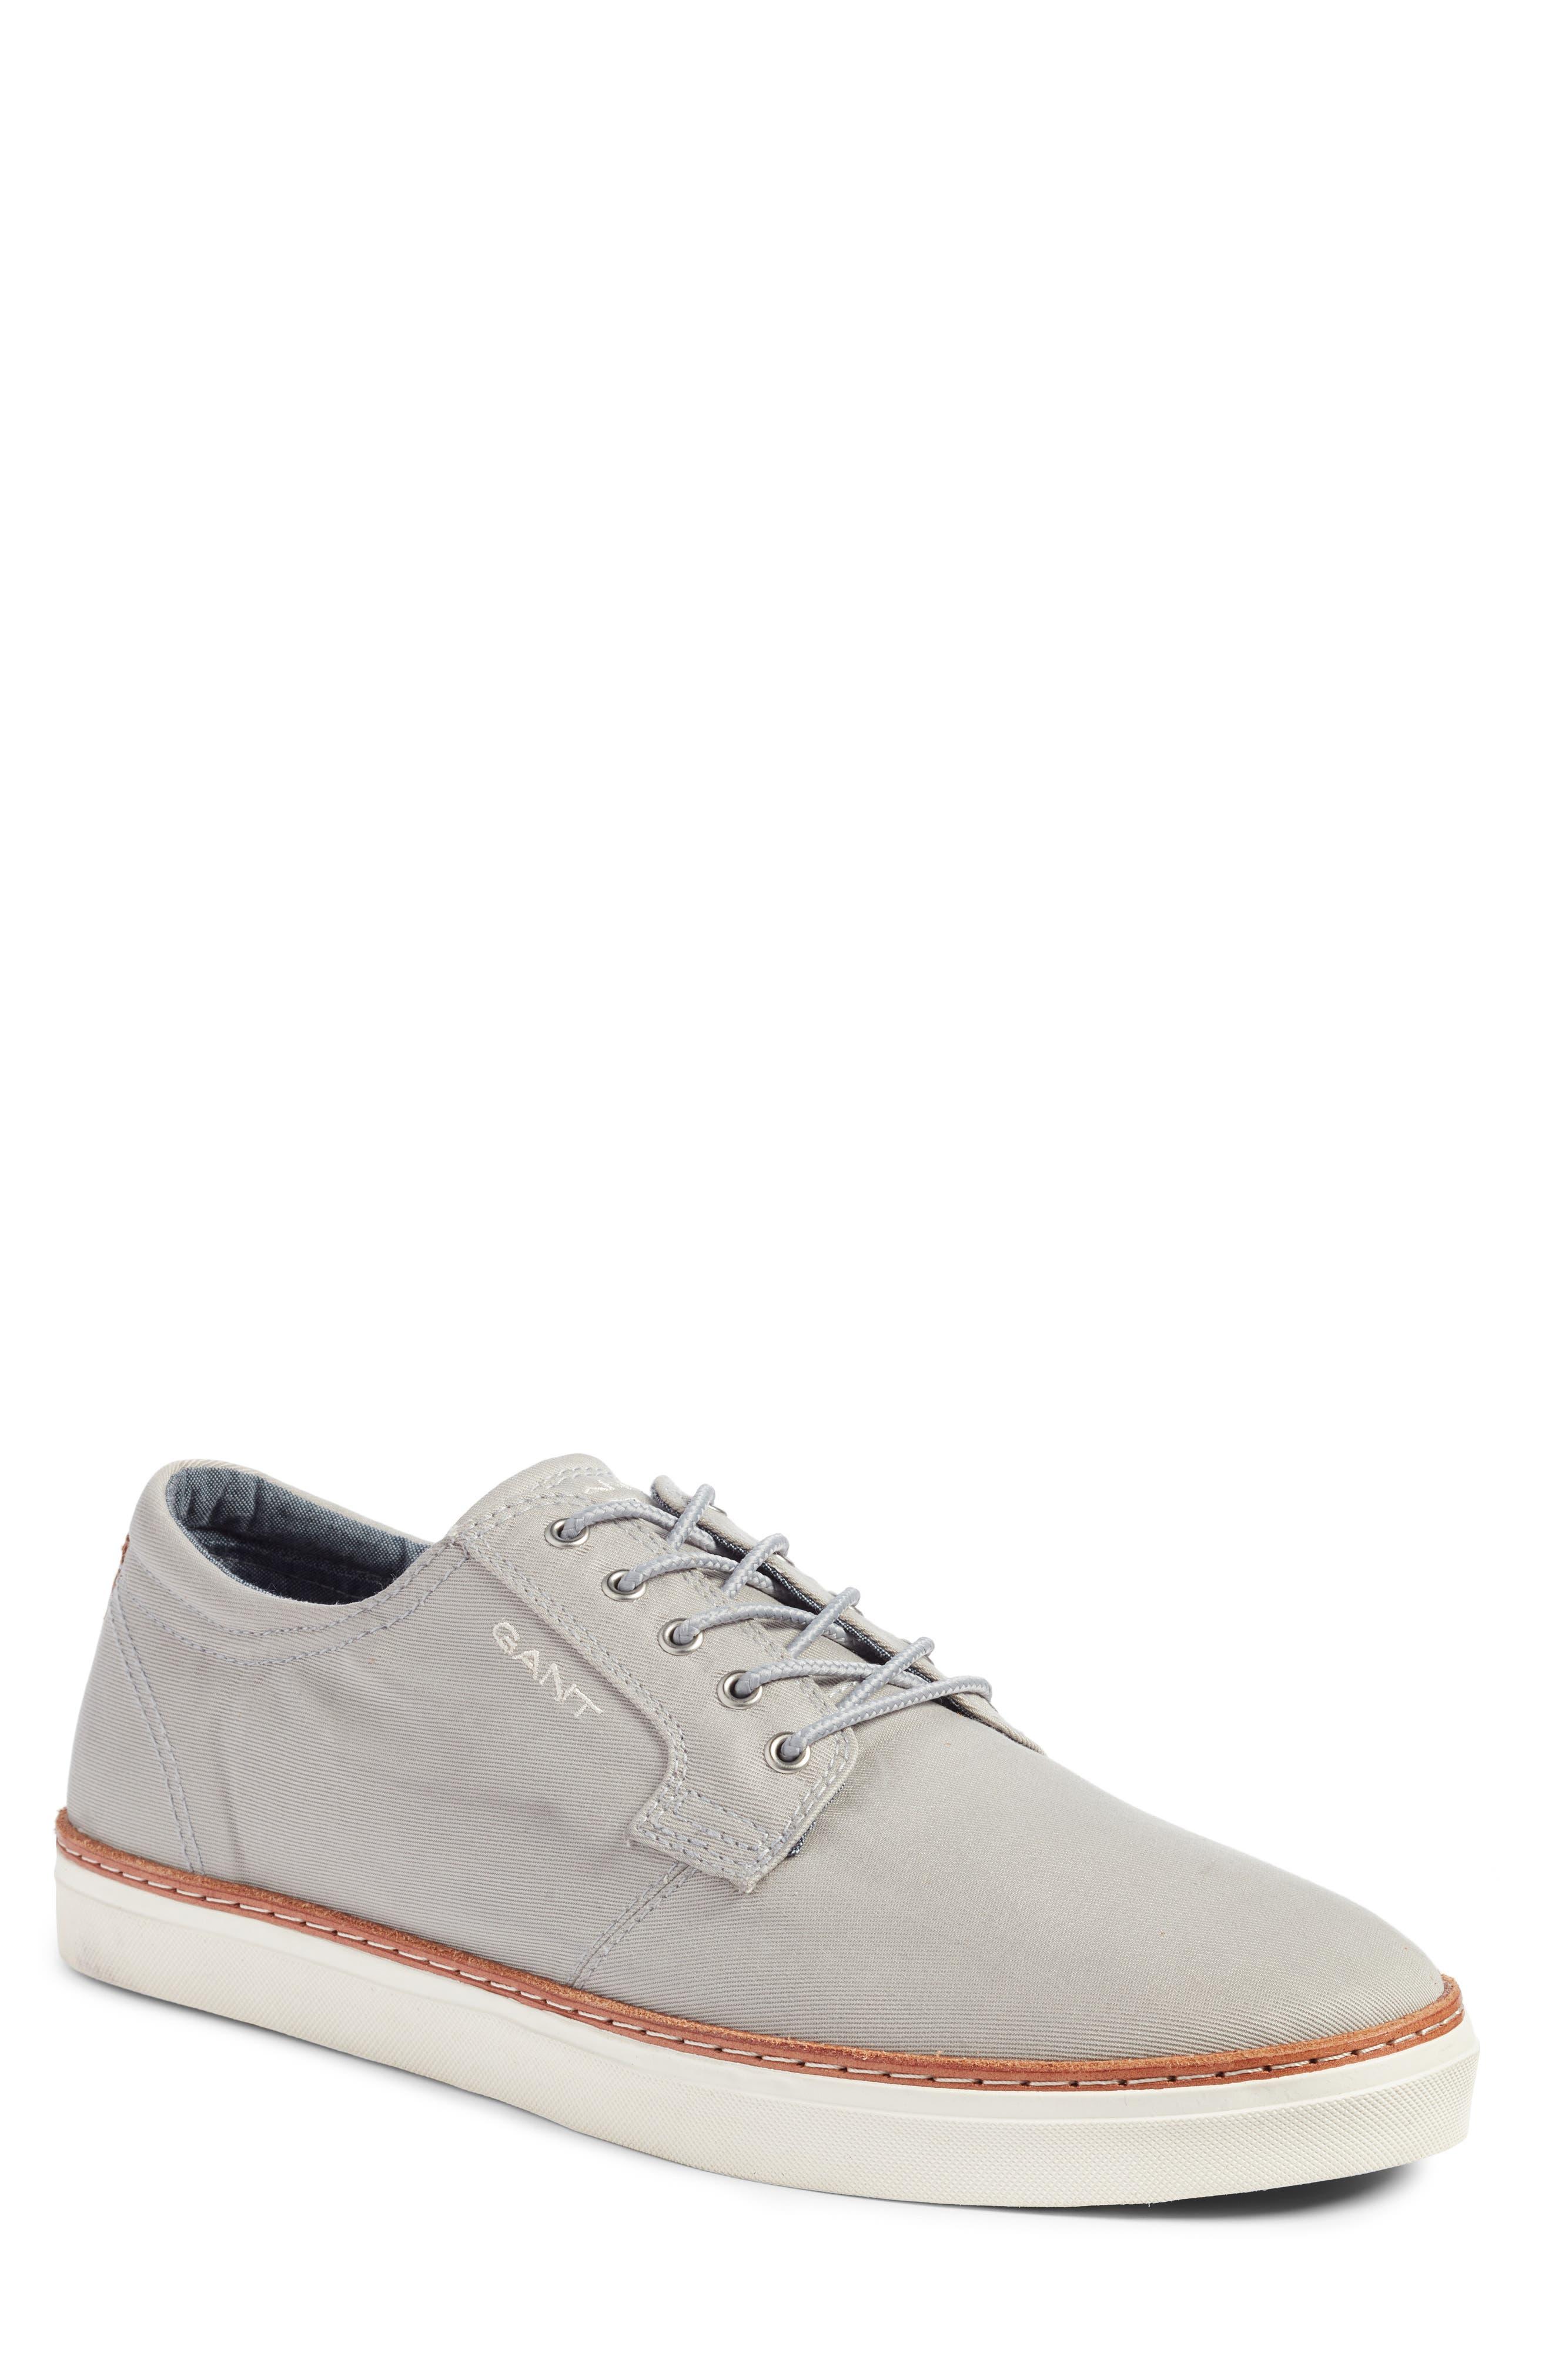 Bari Sneaker,                             Main thumbnail 1, color,                             SLEET GRAY